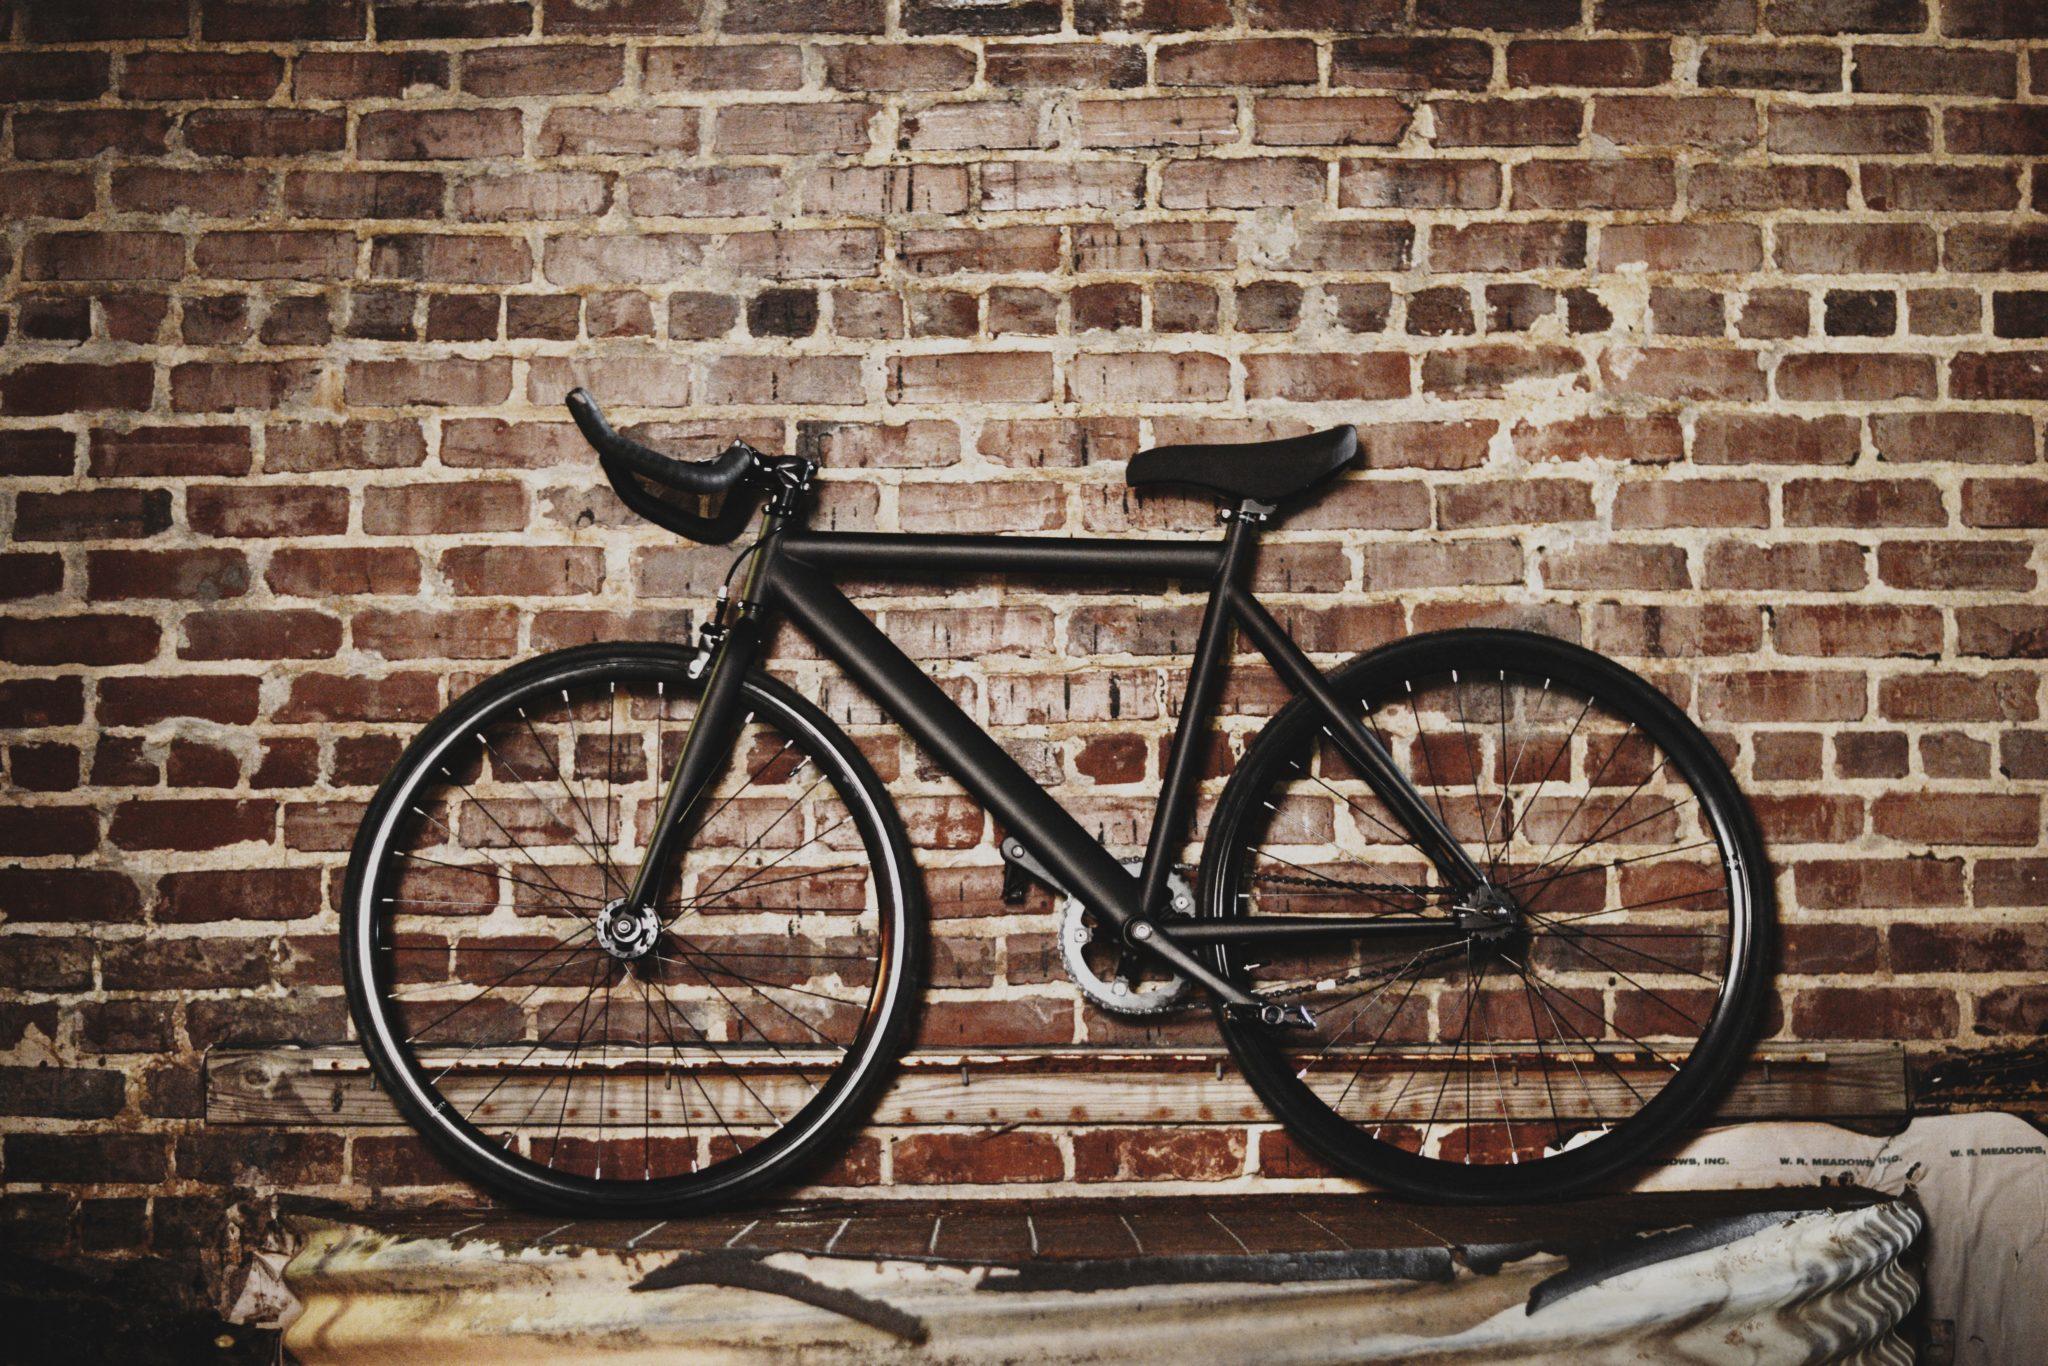 Cycling Sports & Outdoors Alloy riser Single Speed Urban Fixie Handlebars small Handlebar 25.4 width 420